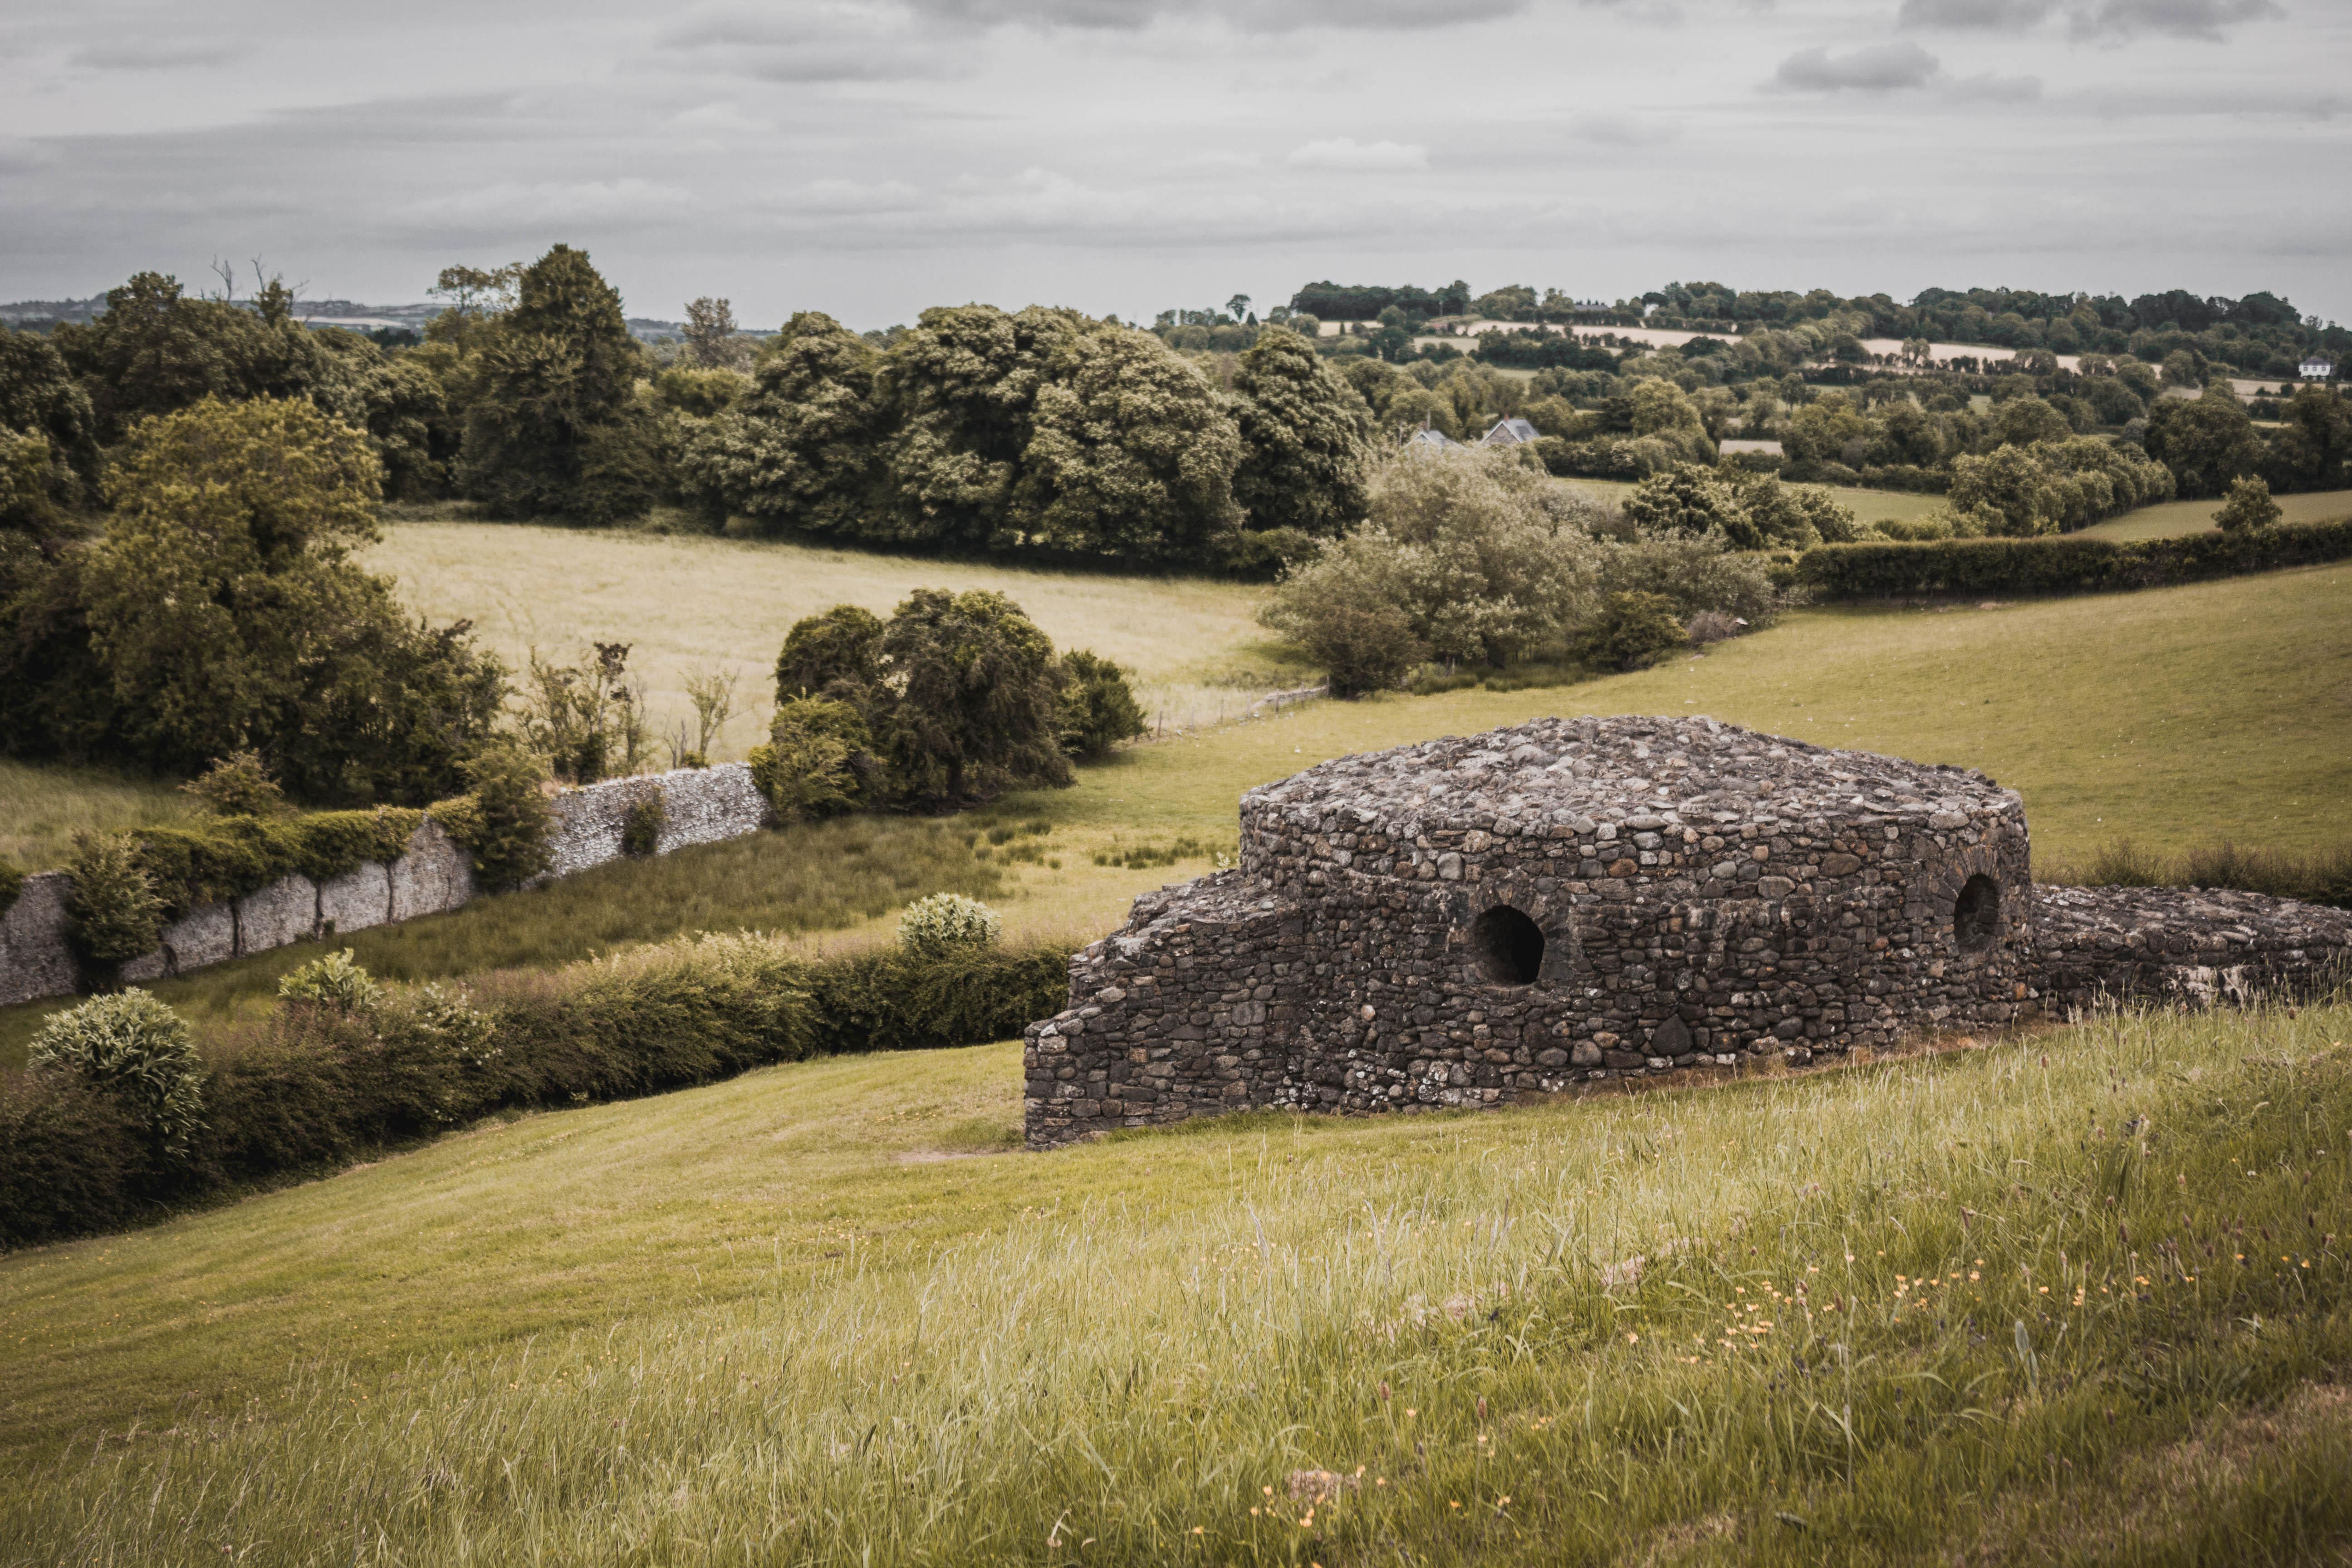 Travel Ireland from Boiled Wheat Blog by Kristen McSorley, Bozeman Montana Photographer